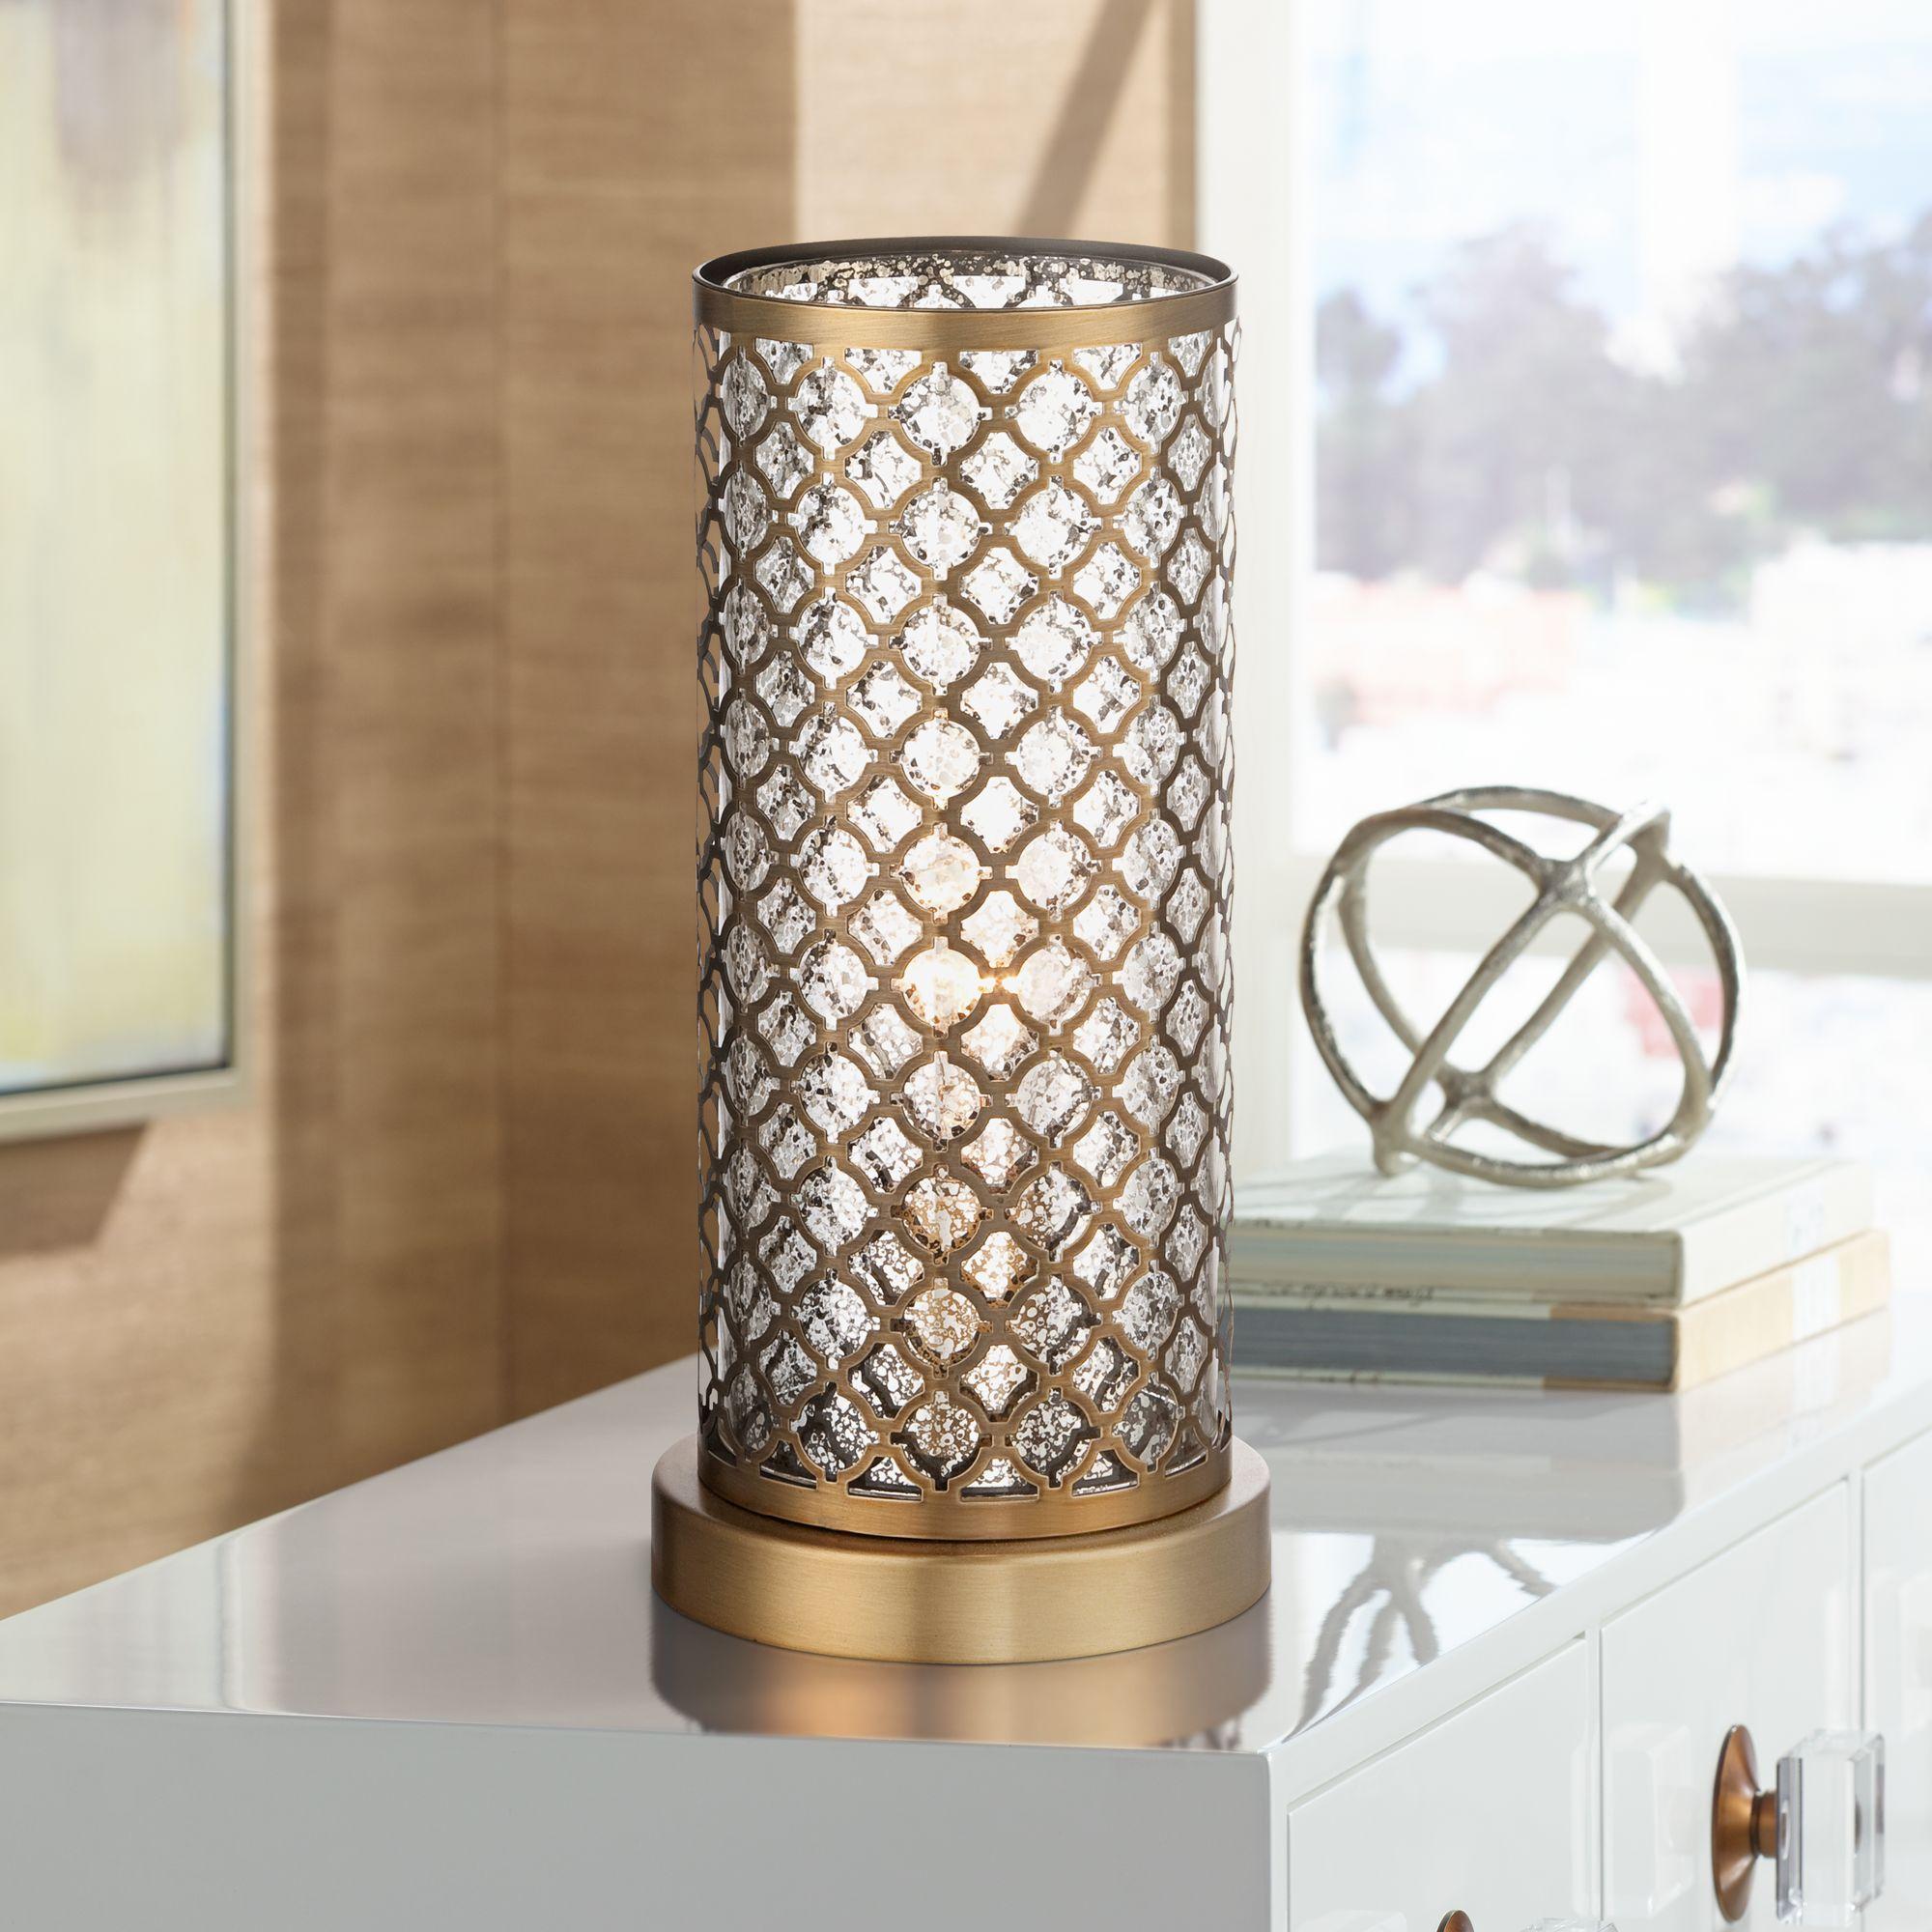 "360 Lighting Alcazar Brass And Mercury Glass 12"" High Accent Light"